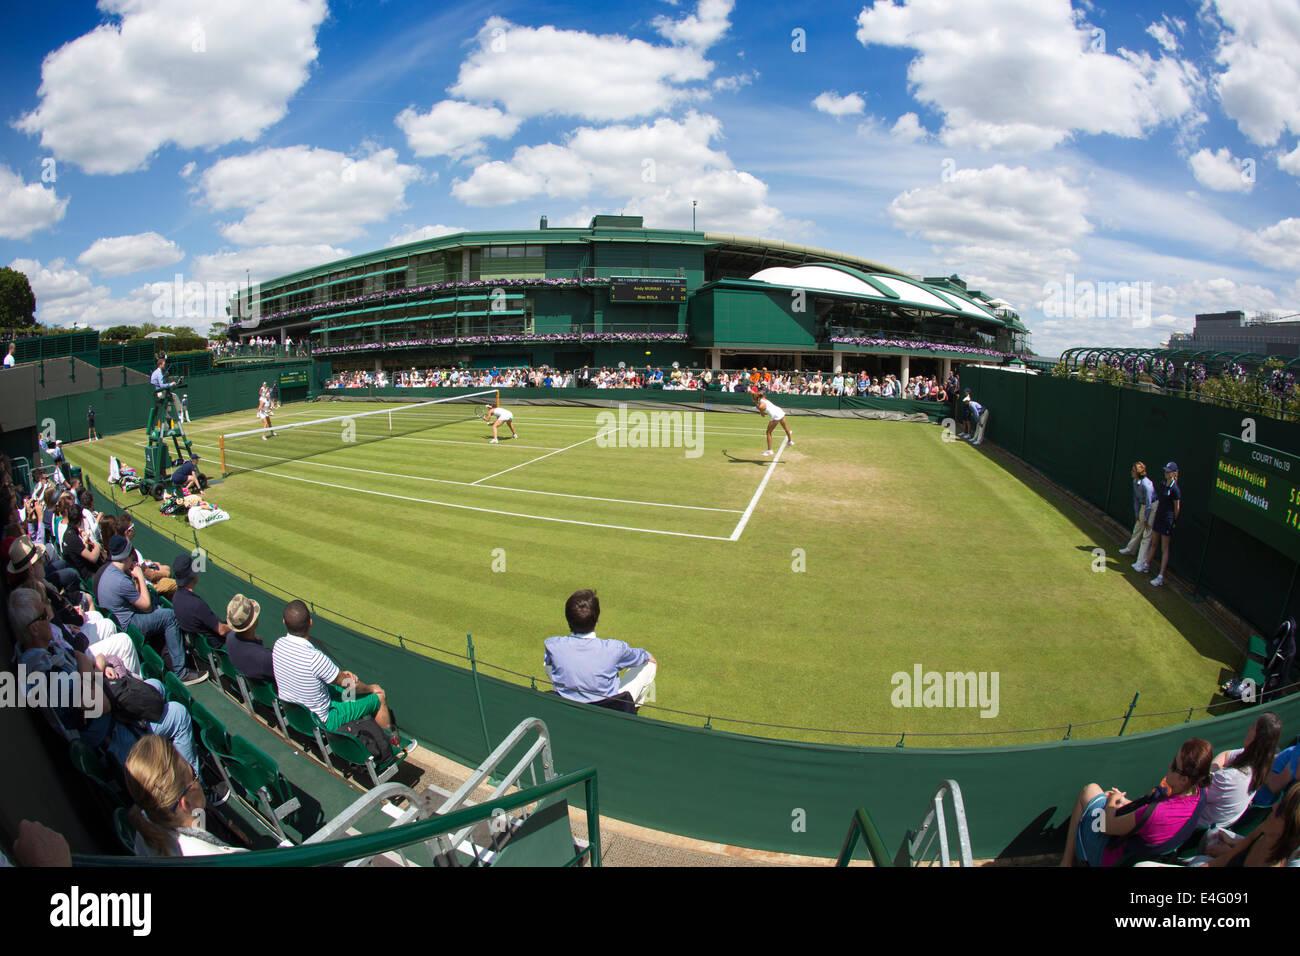 Show Court No.19, Wimbledon Tennis Championships 2014, Southwest London, England, UK - Stock Image